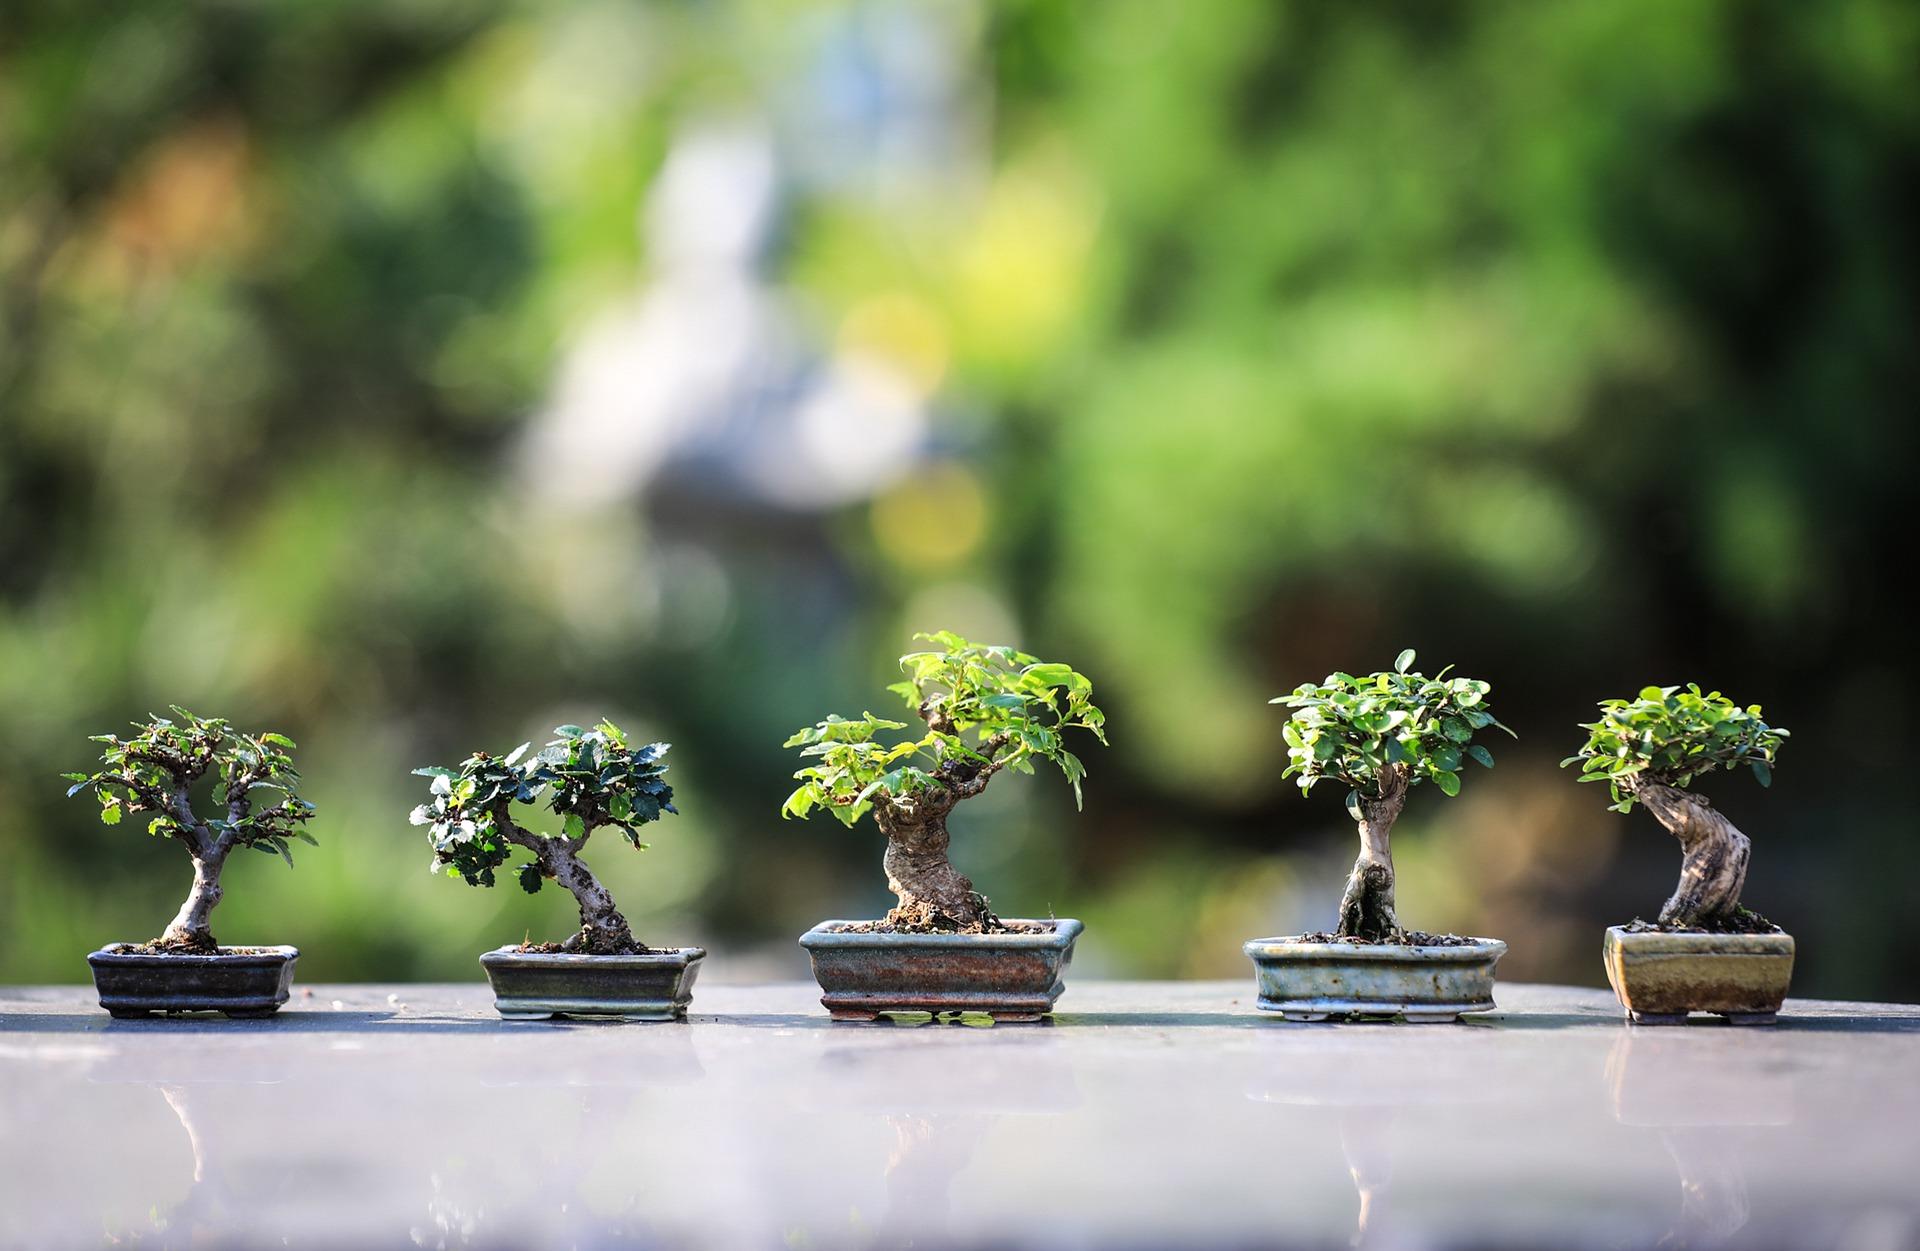 bonsai-4634225_1920.jpg